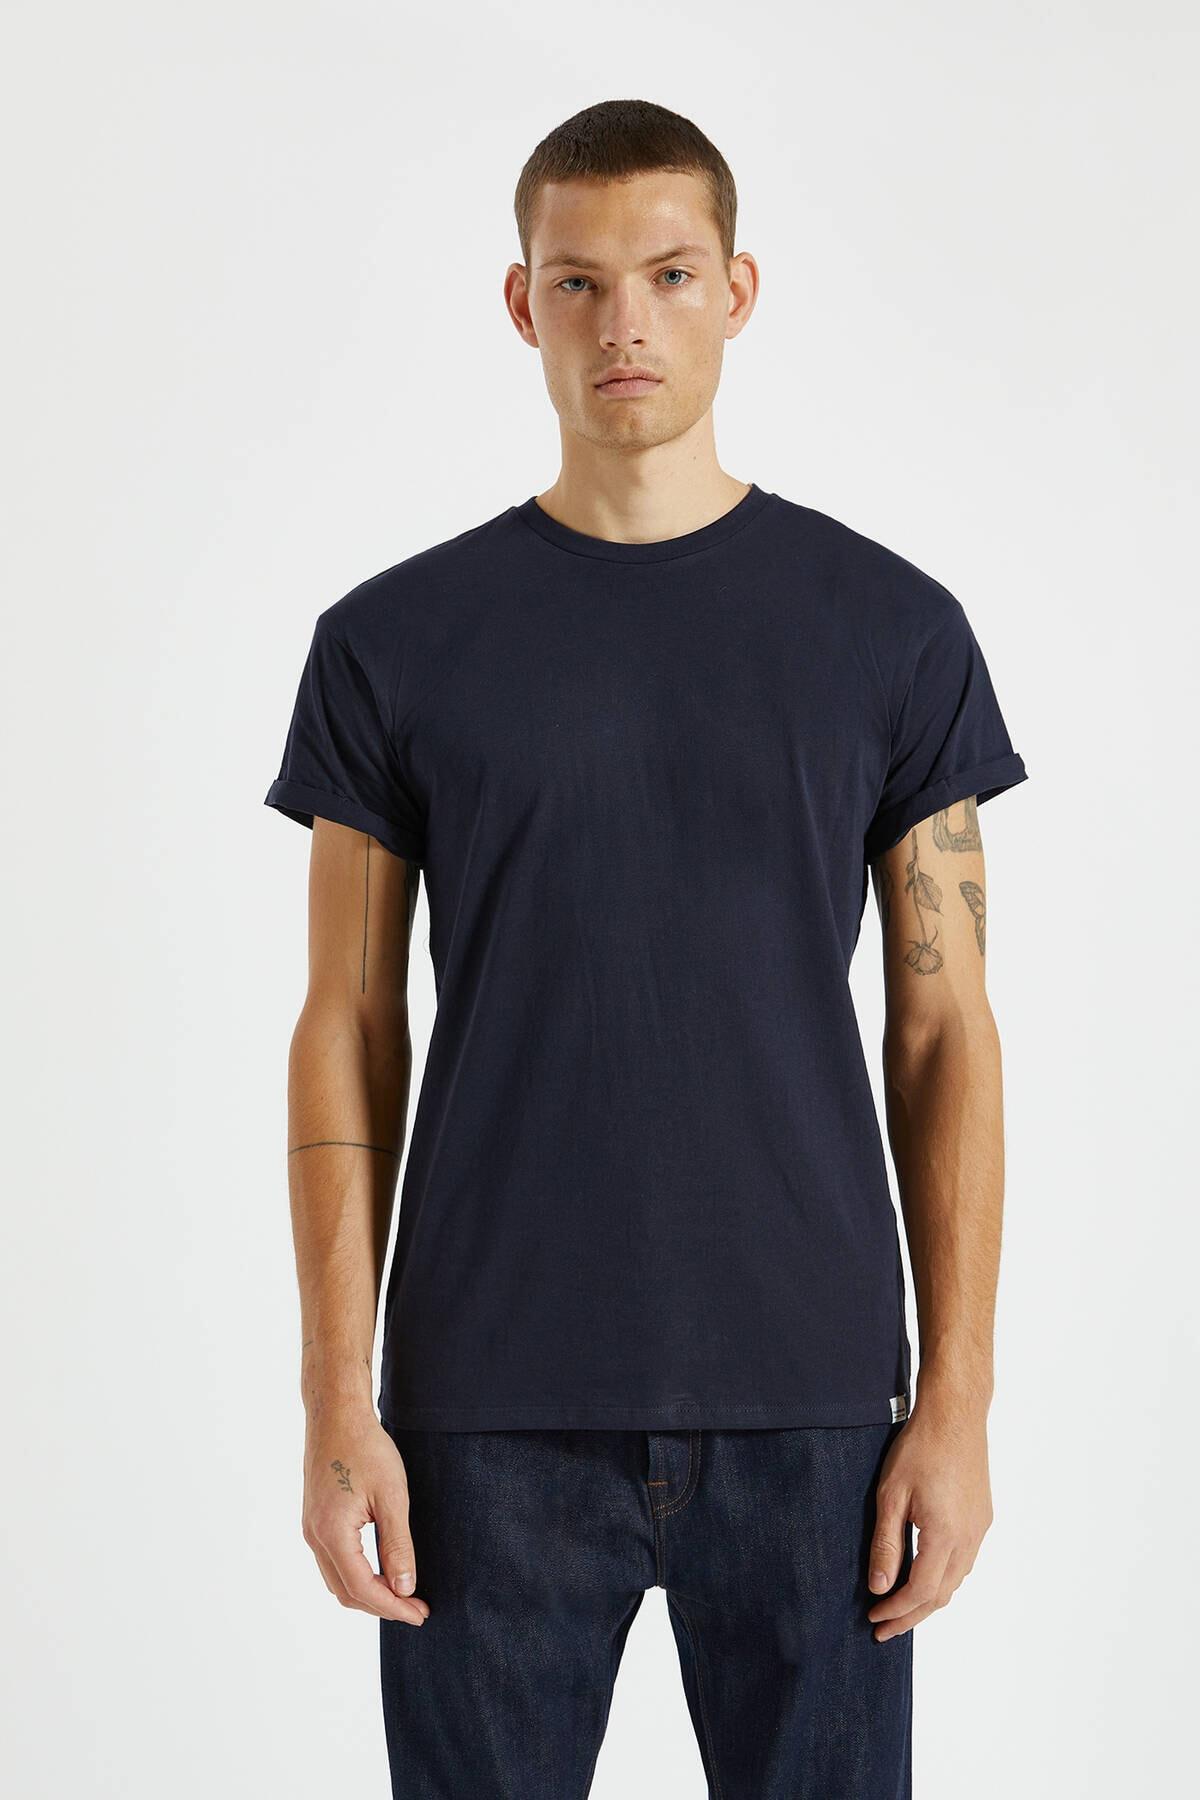 Pull & Bear Erkek Lacivert Logolu Basic Muscle Fit T-Shirt 09244941 0